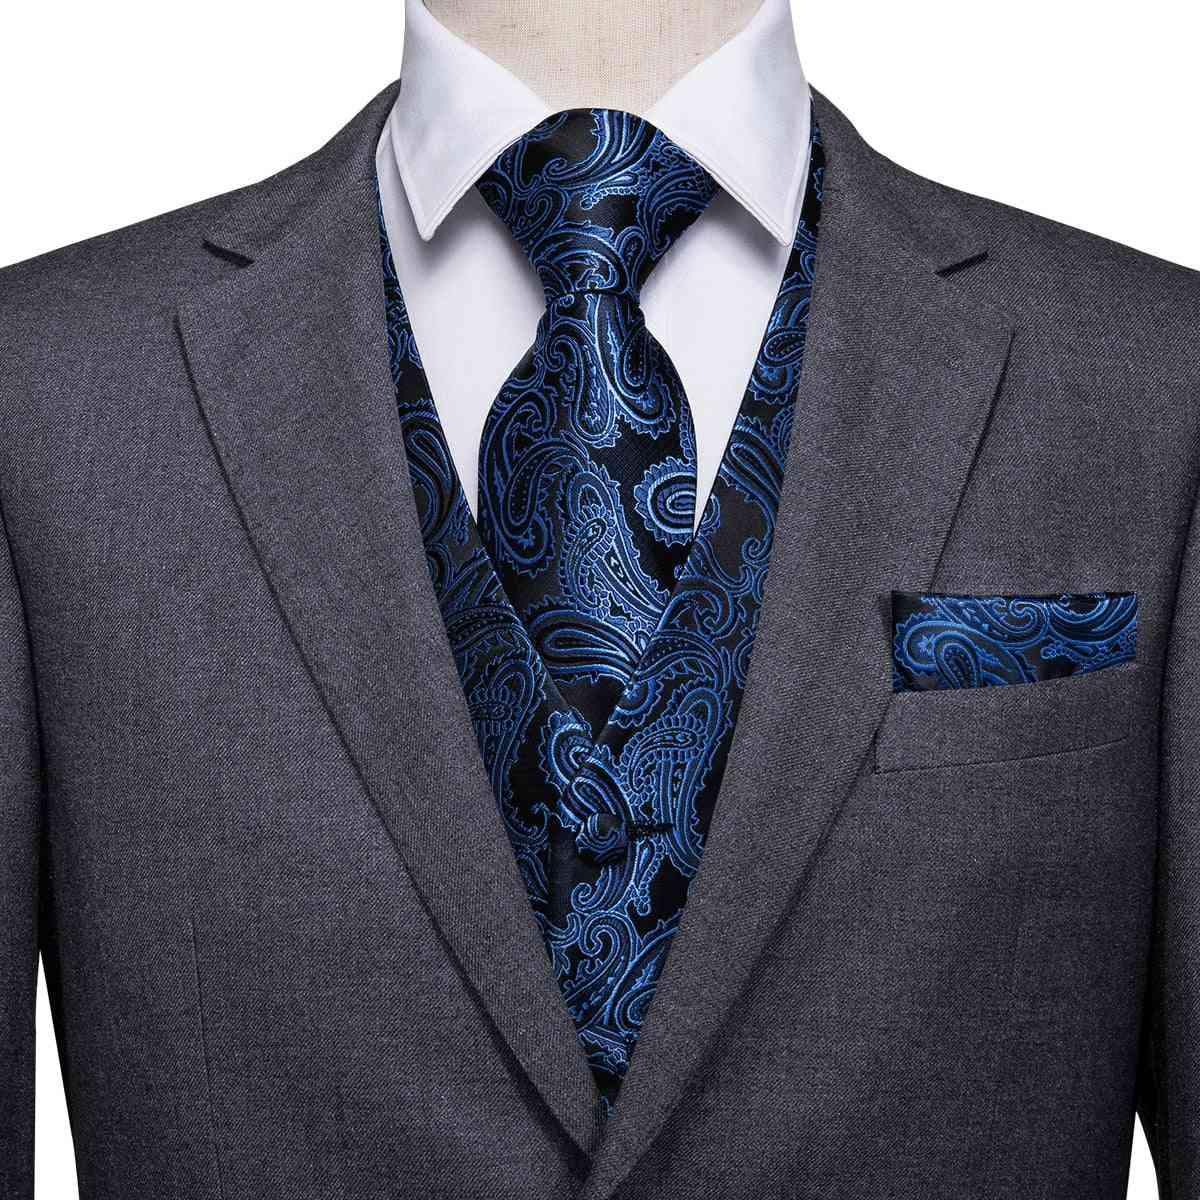 Silk- Jacquard Suit, Vest, Waistcoat, Wedding Jacket's